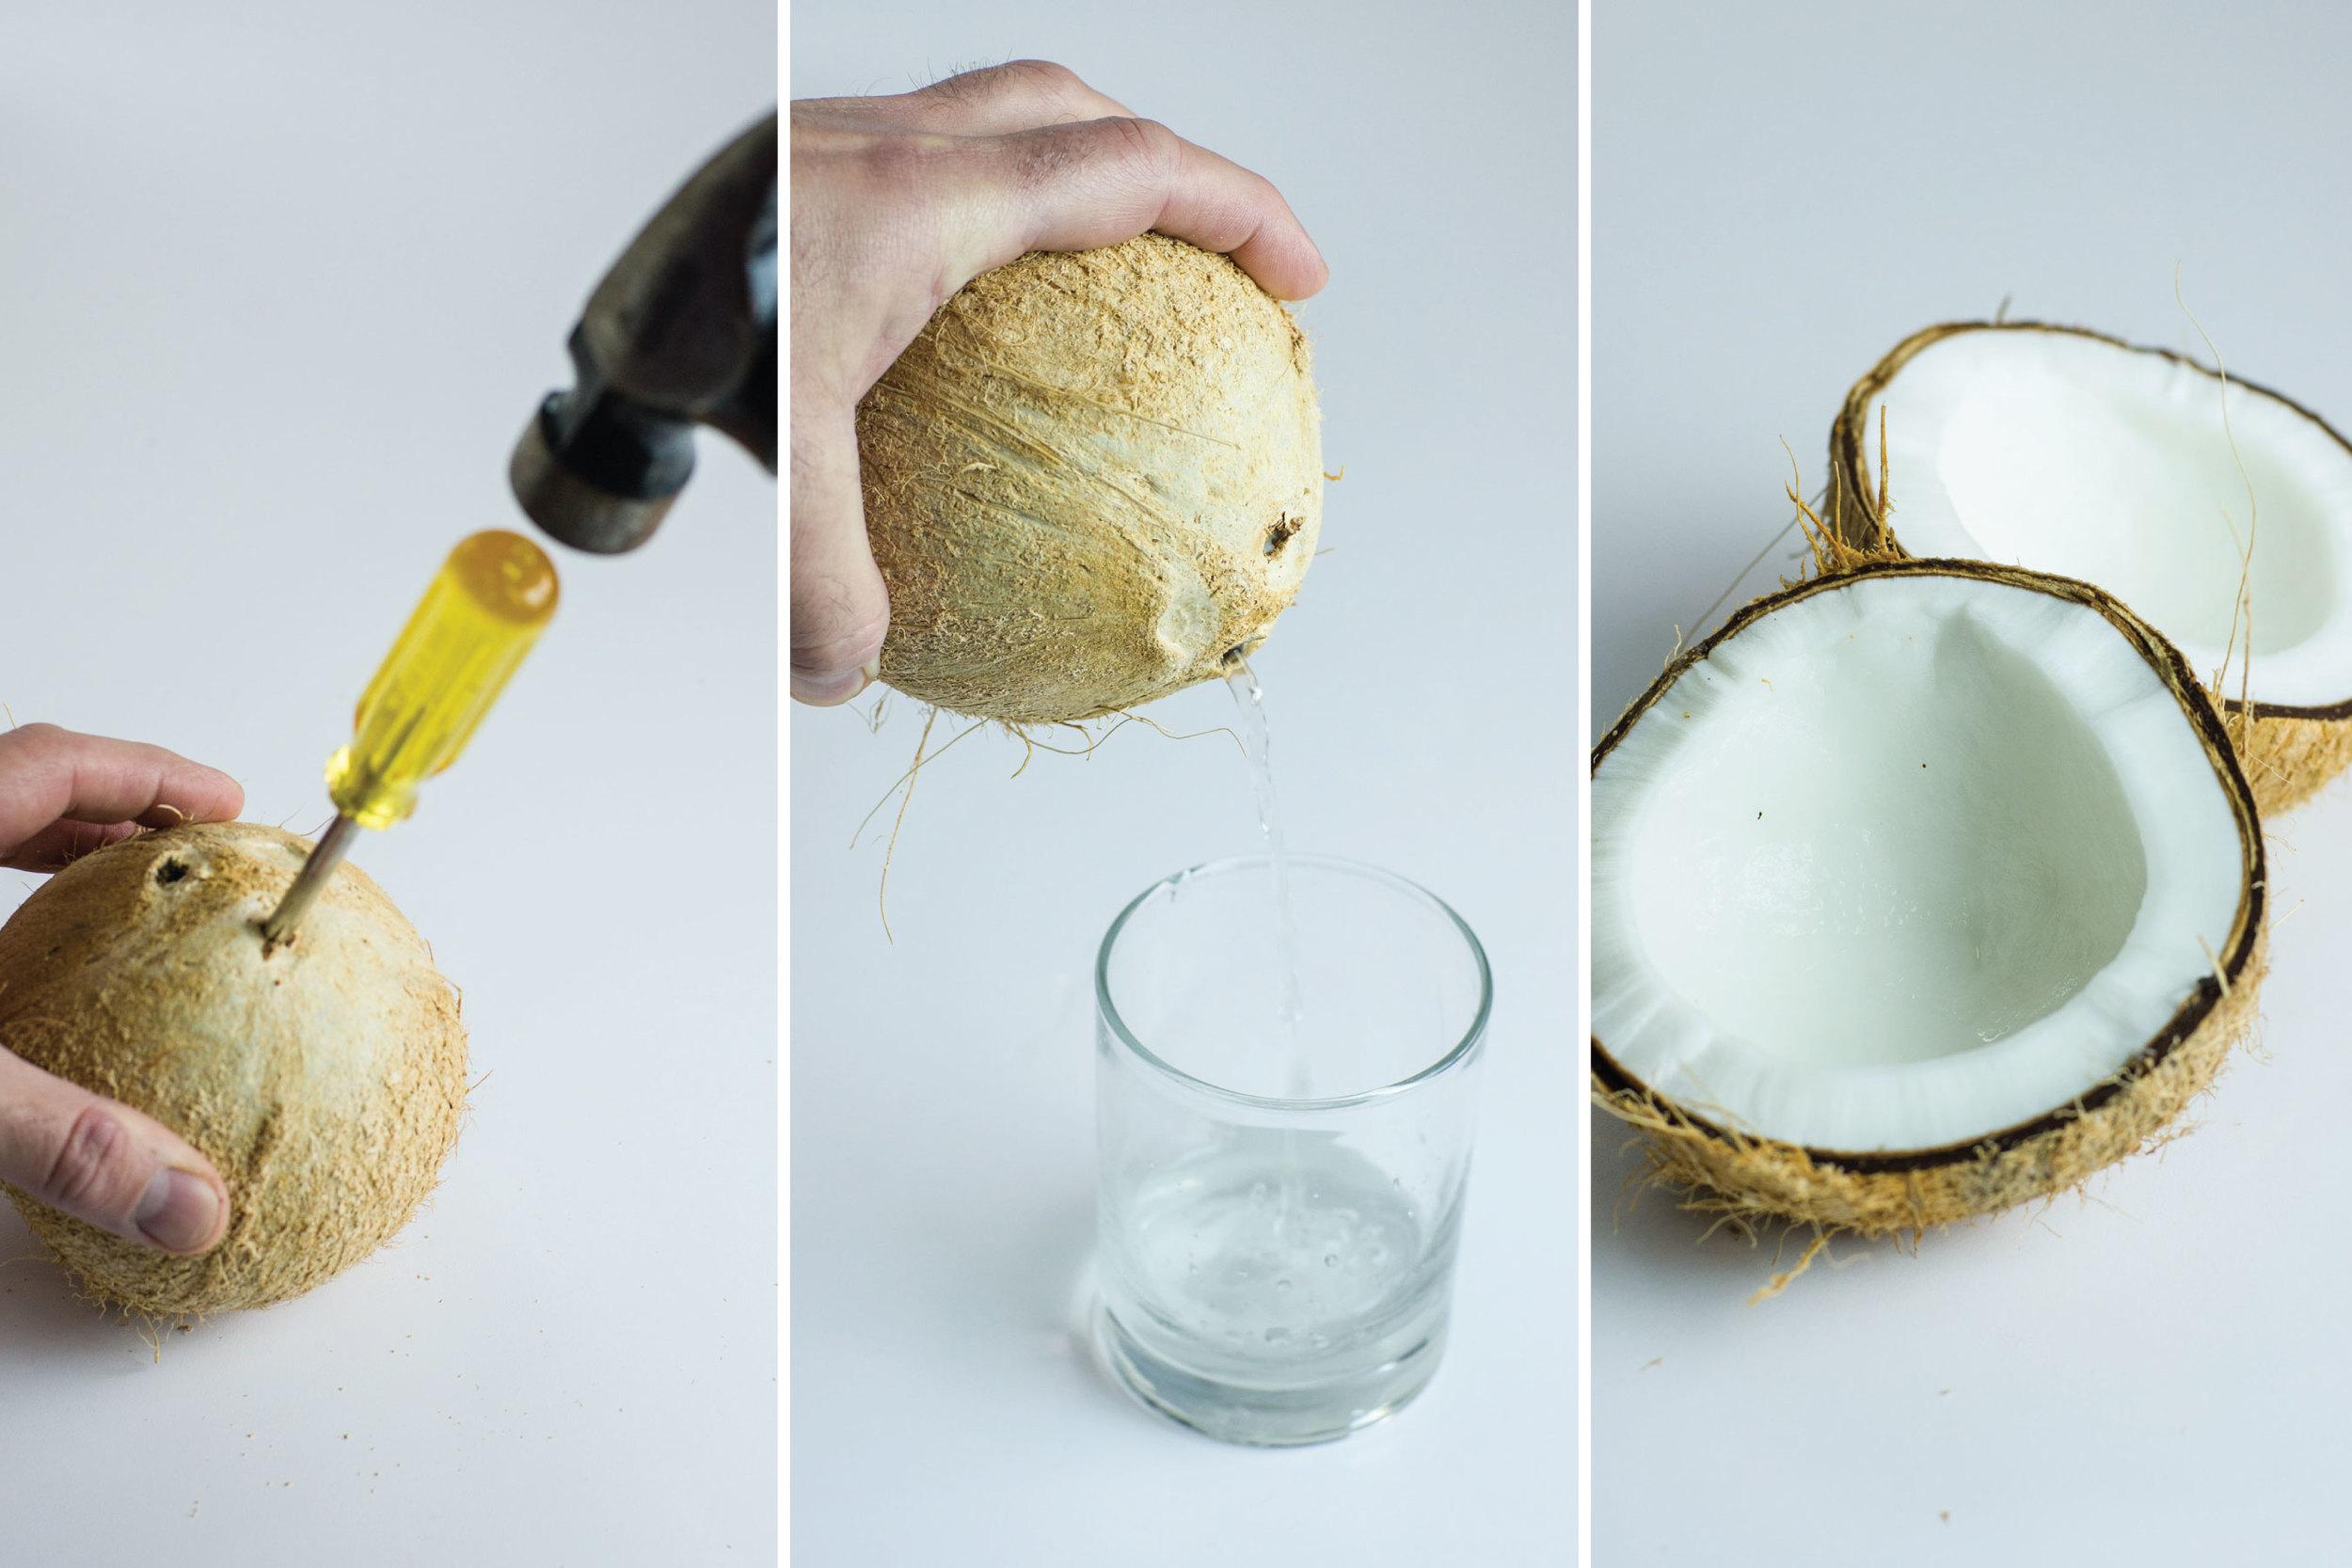 Preparing the fresh coconut